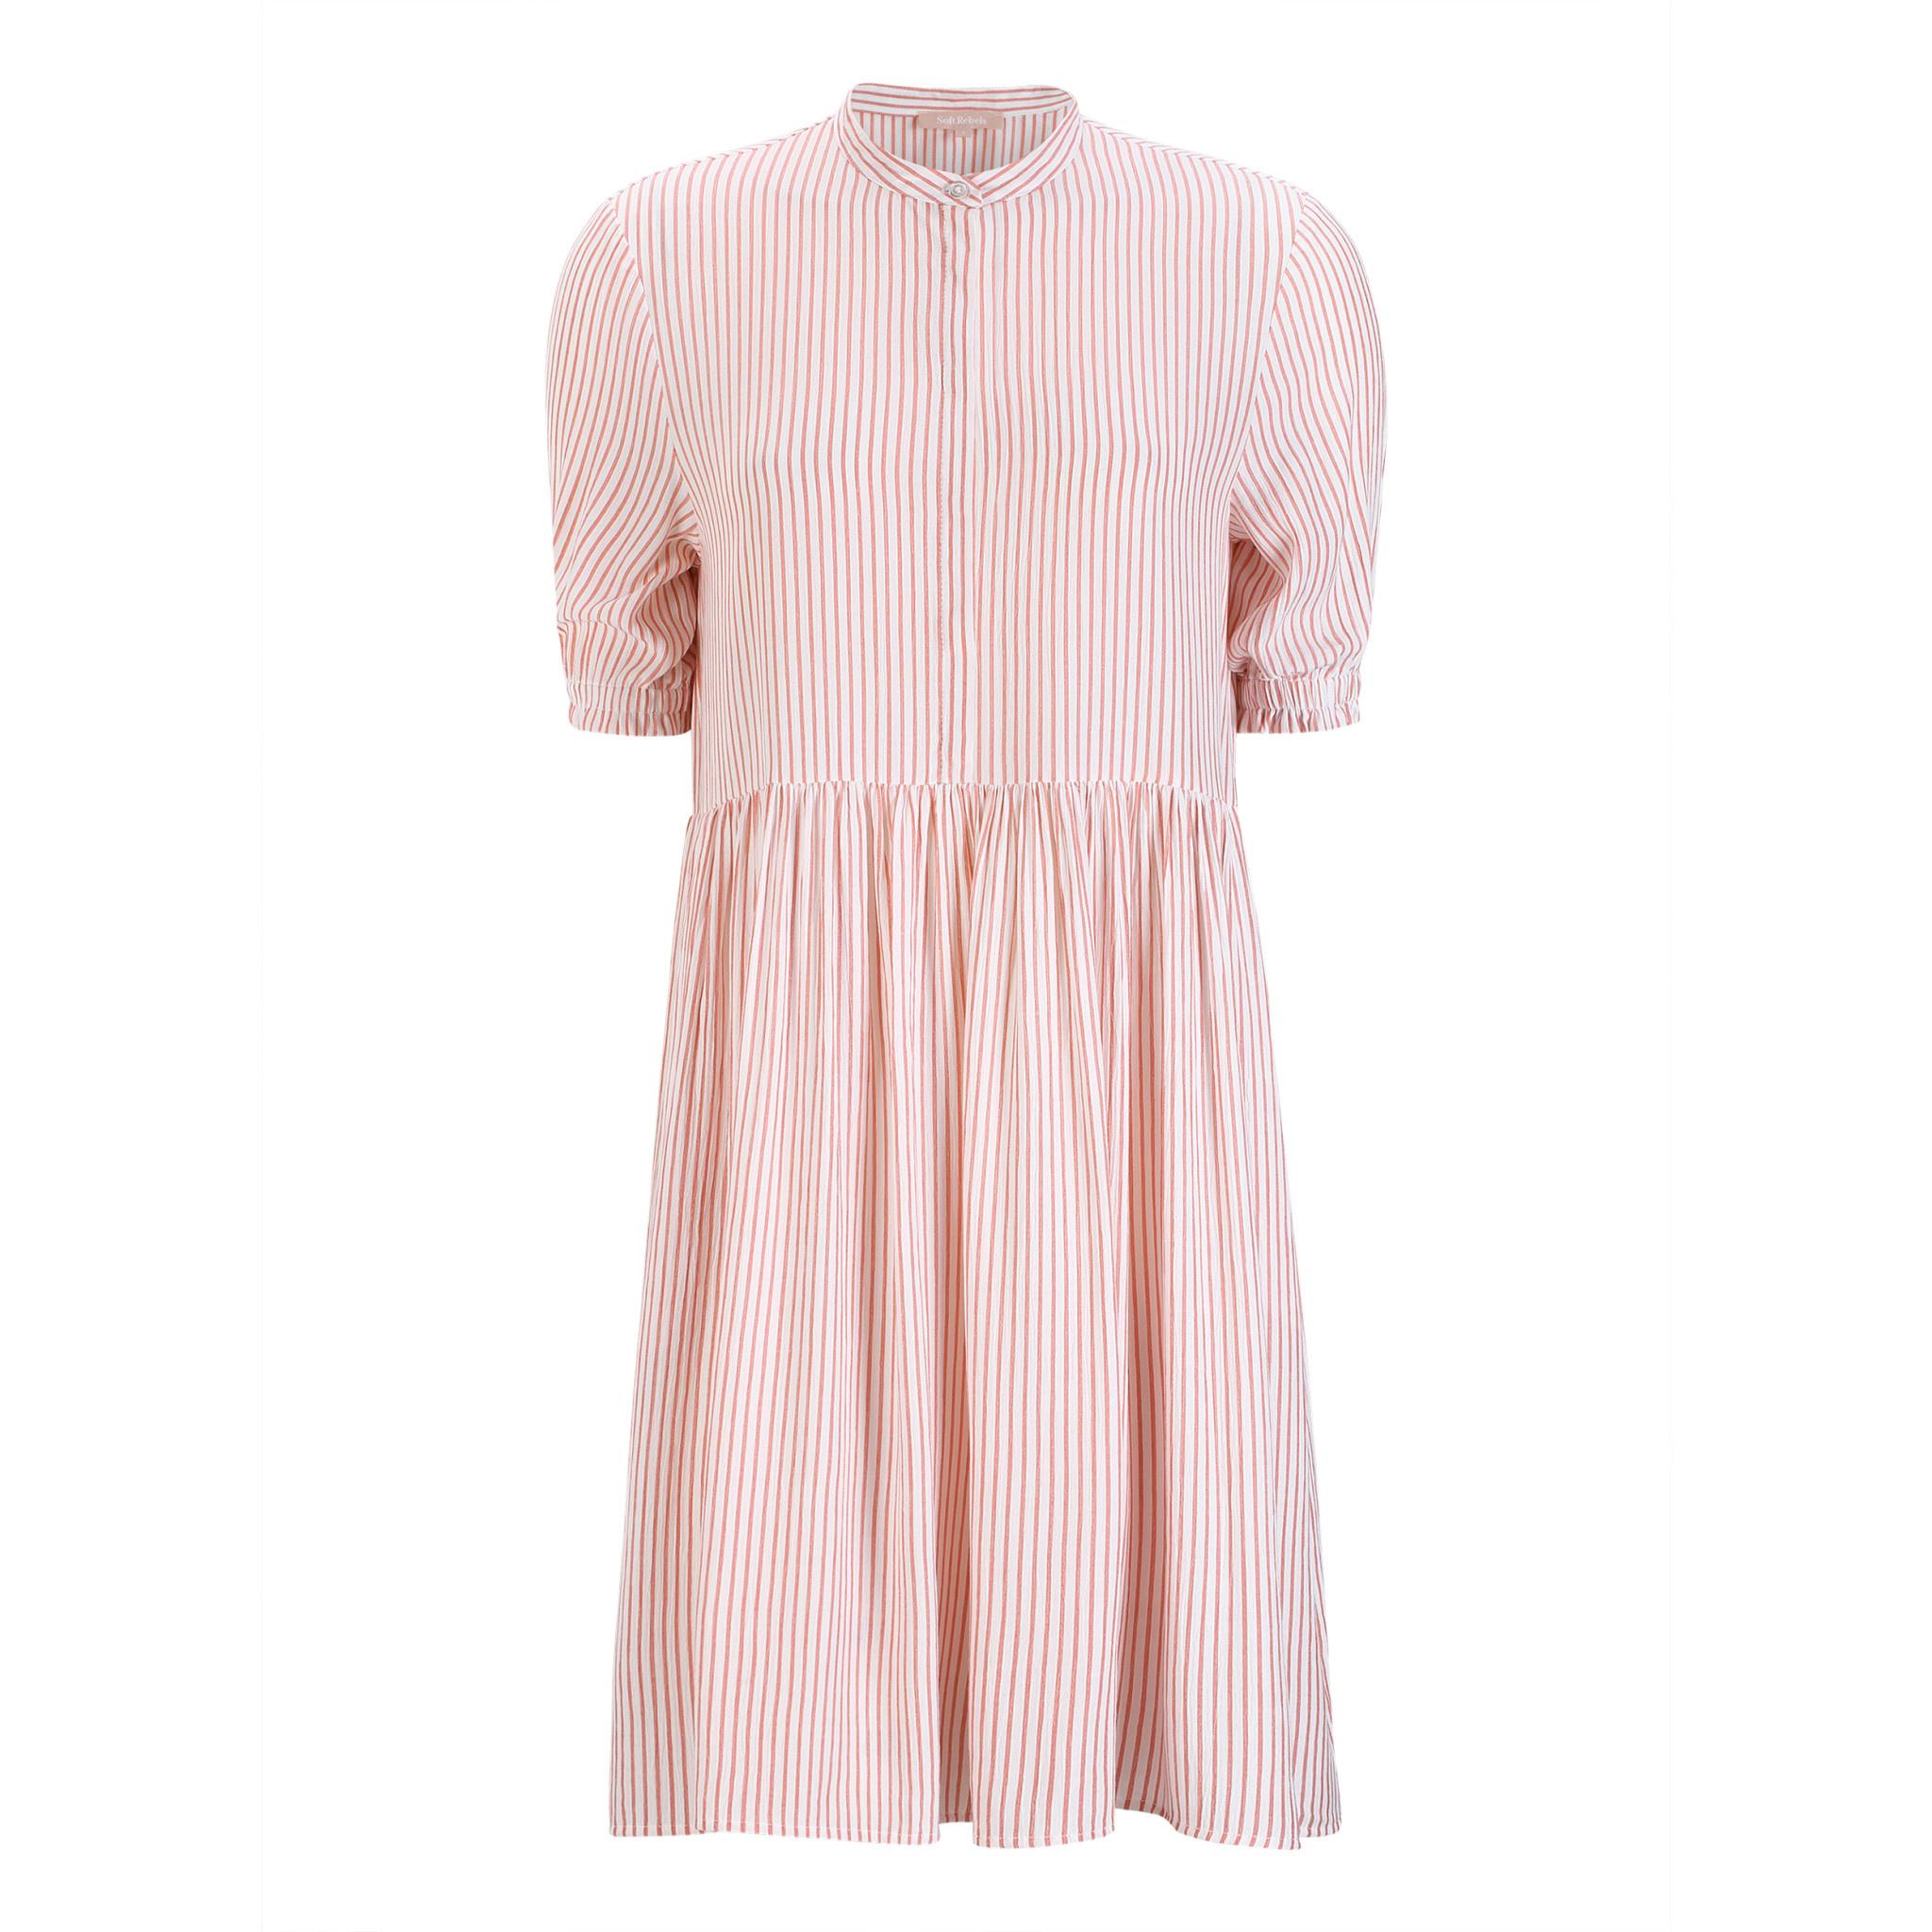 Soft Rebels Allysia Dress - Rose